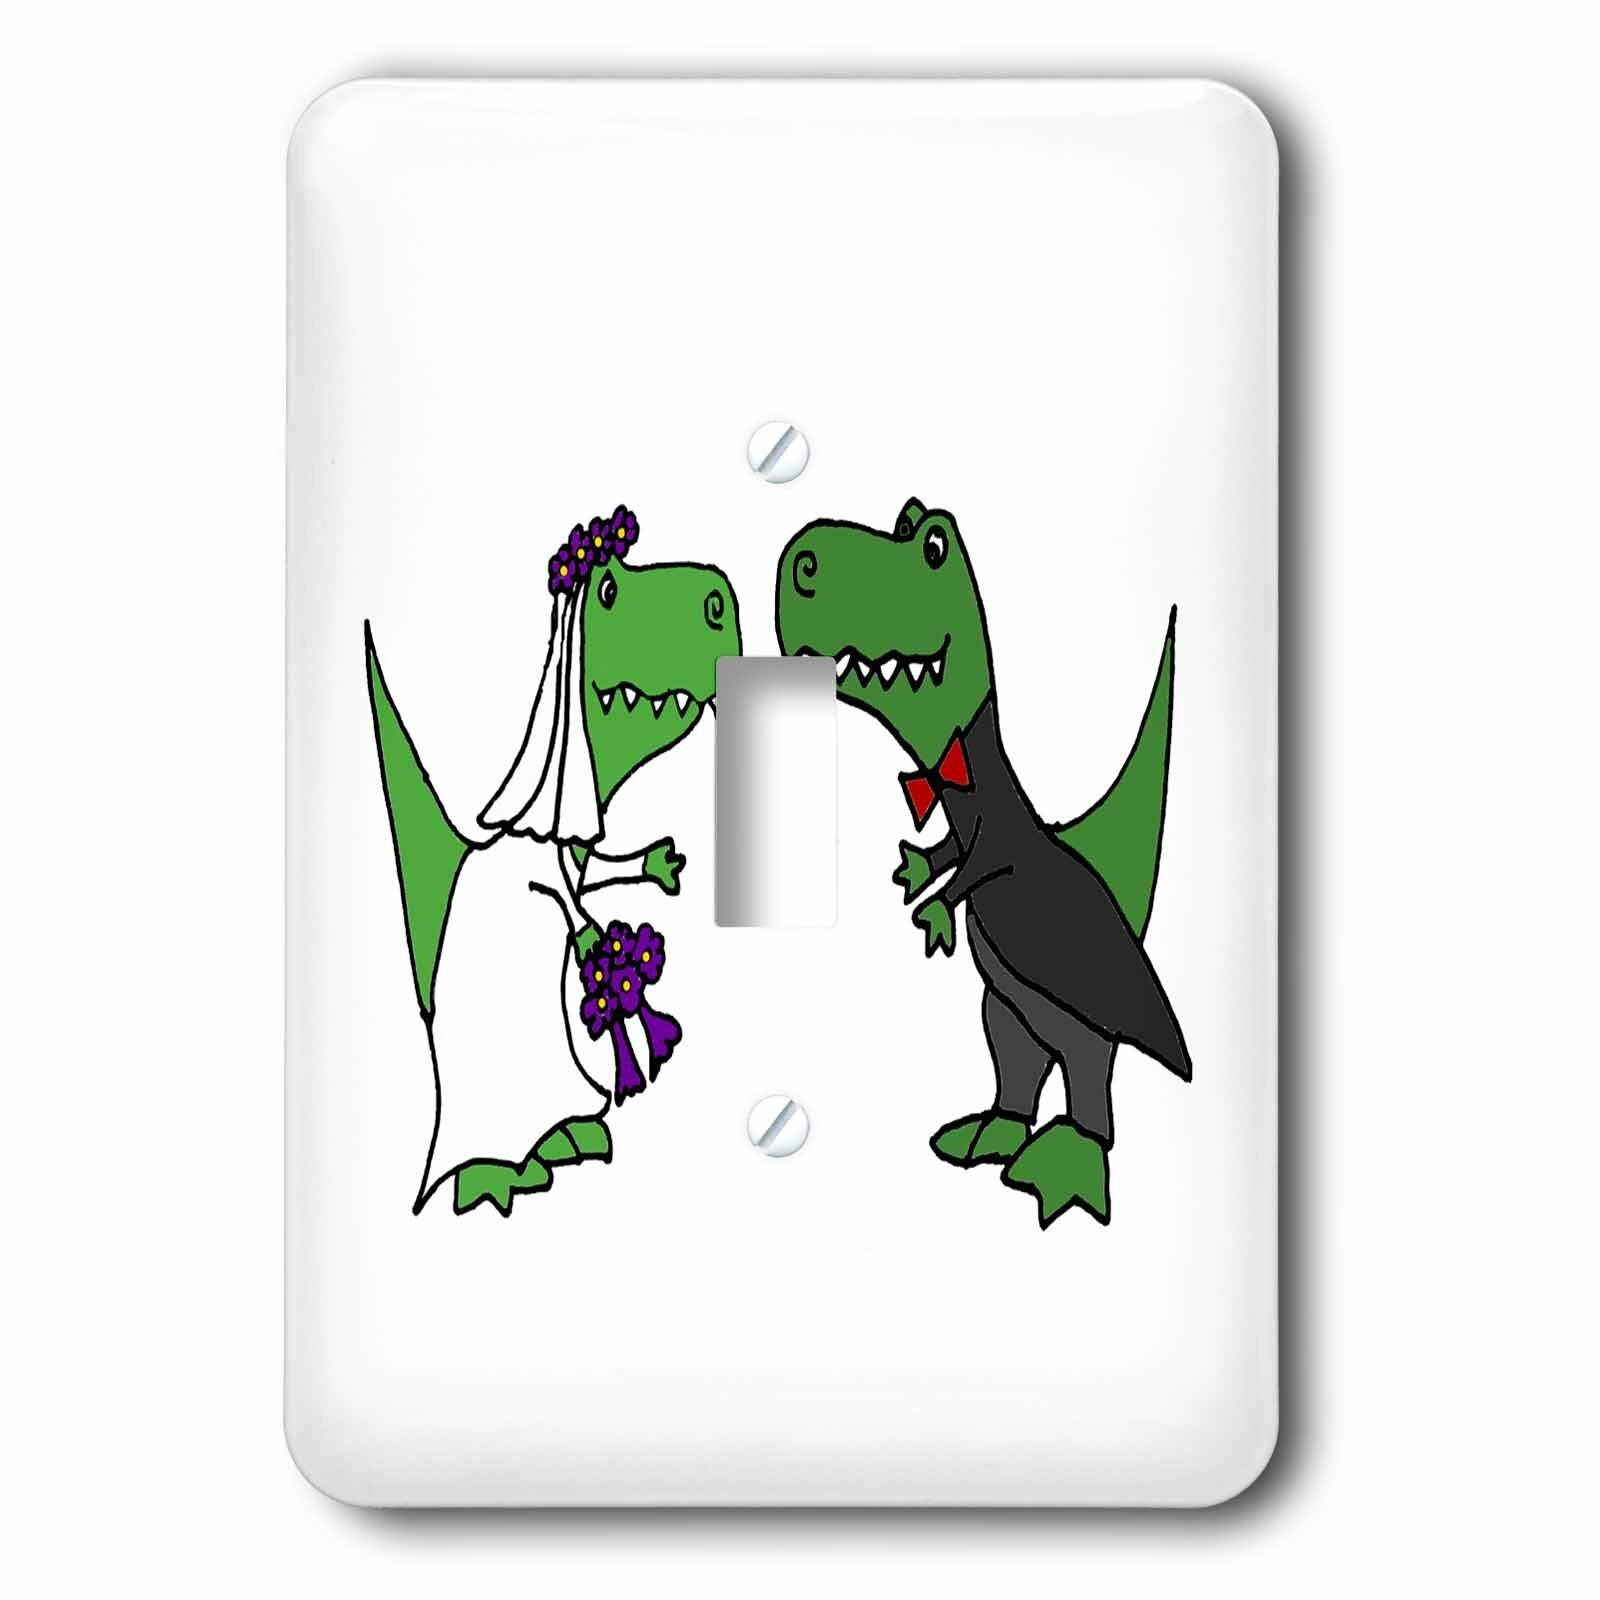 3drose T Rex Dinosaurs Wedding 1 Gang Toggle Light Switch Wall Plate Wayfair